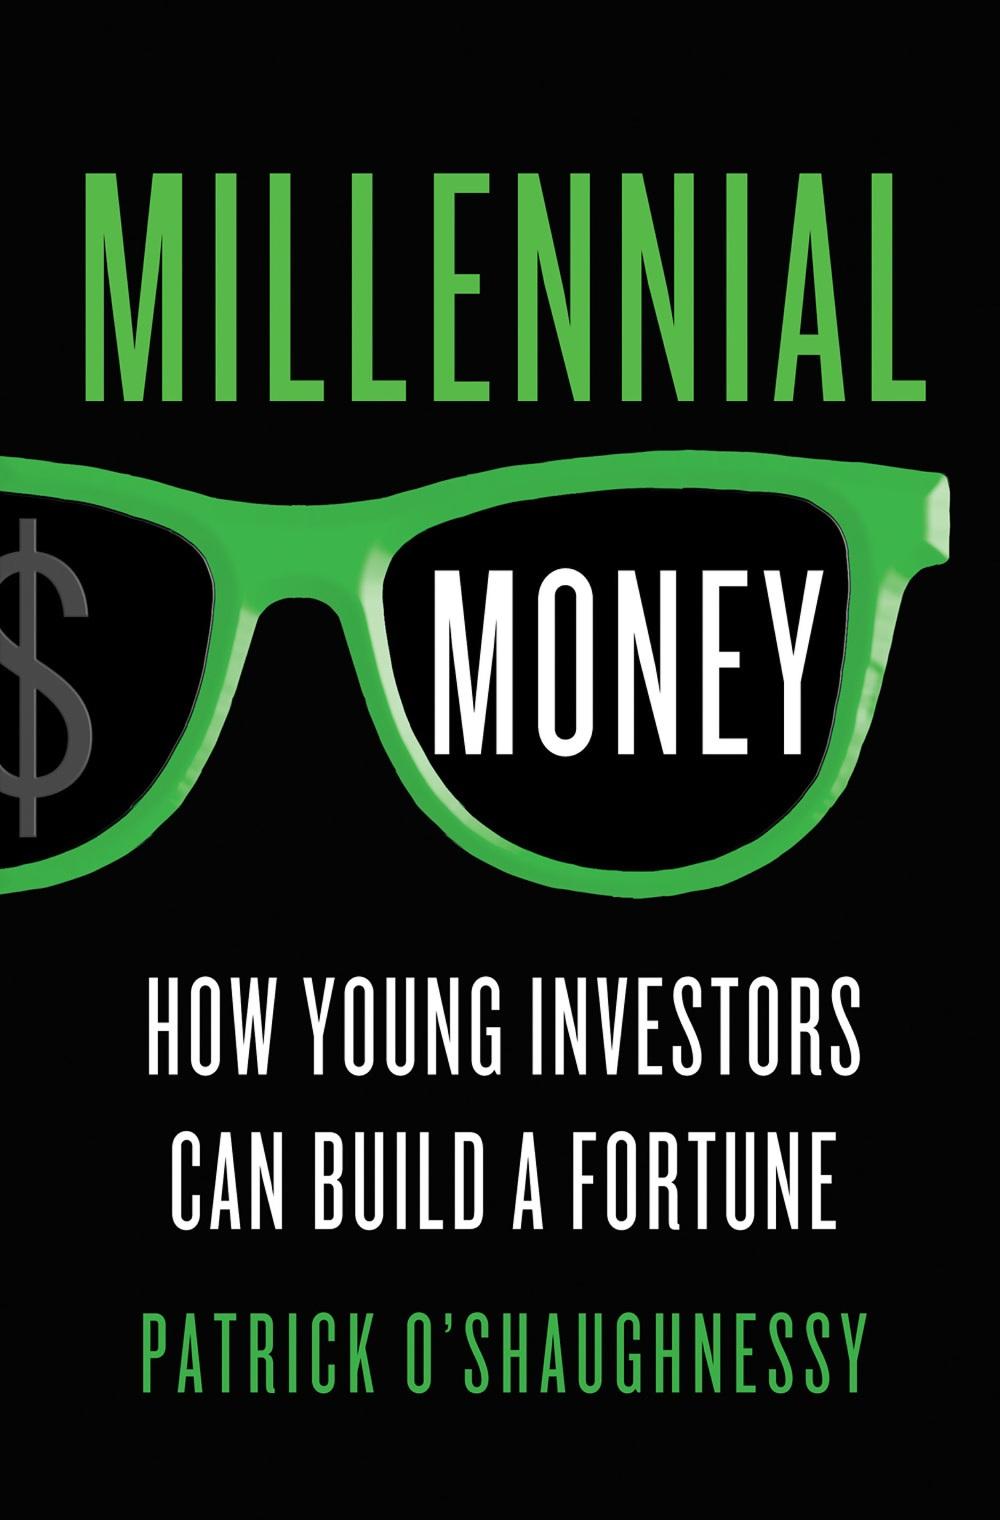 Millennial Money jacket (5).jpg